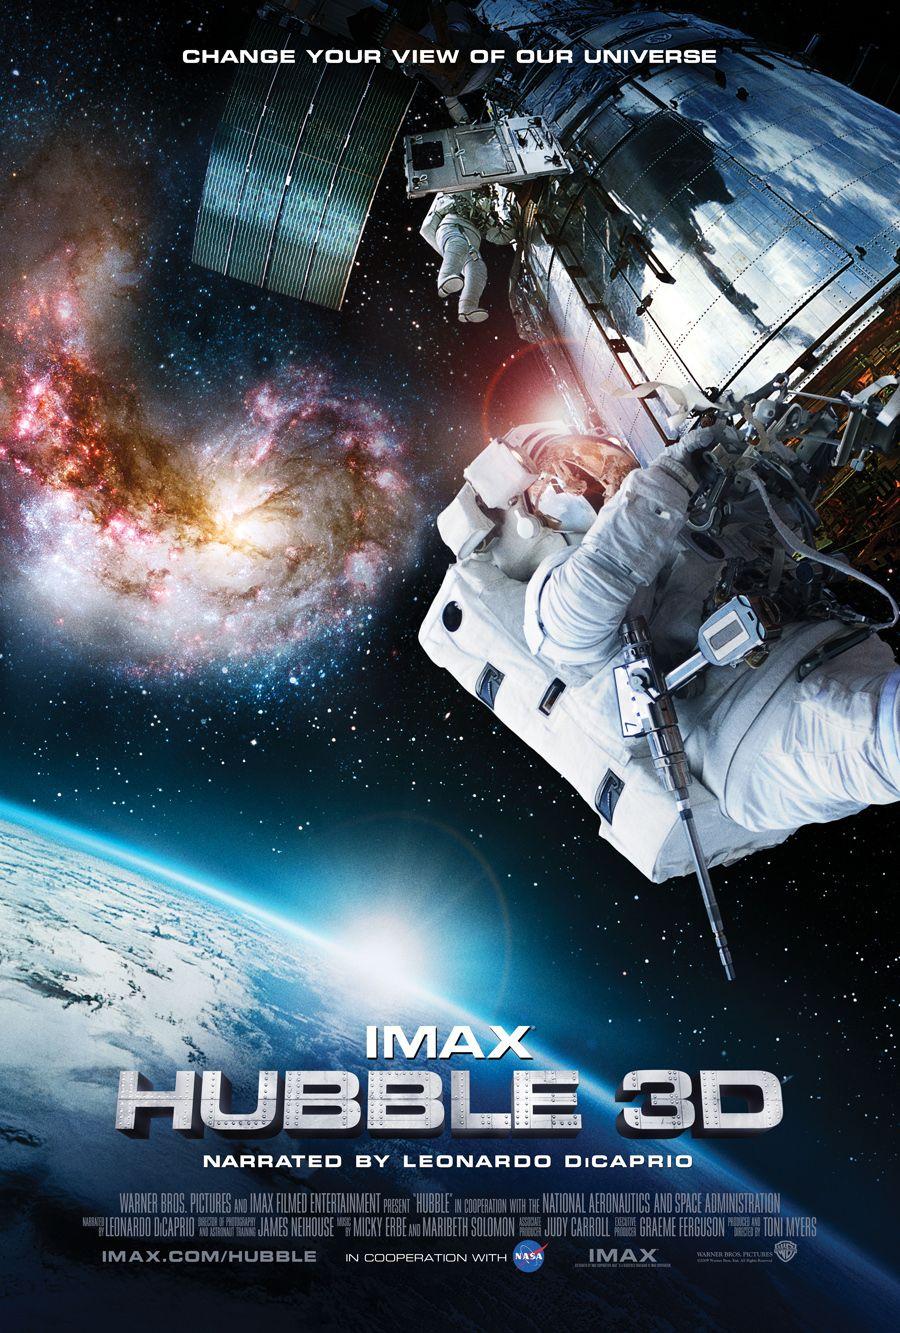 imax hubble 3d -#main